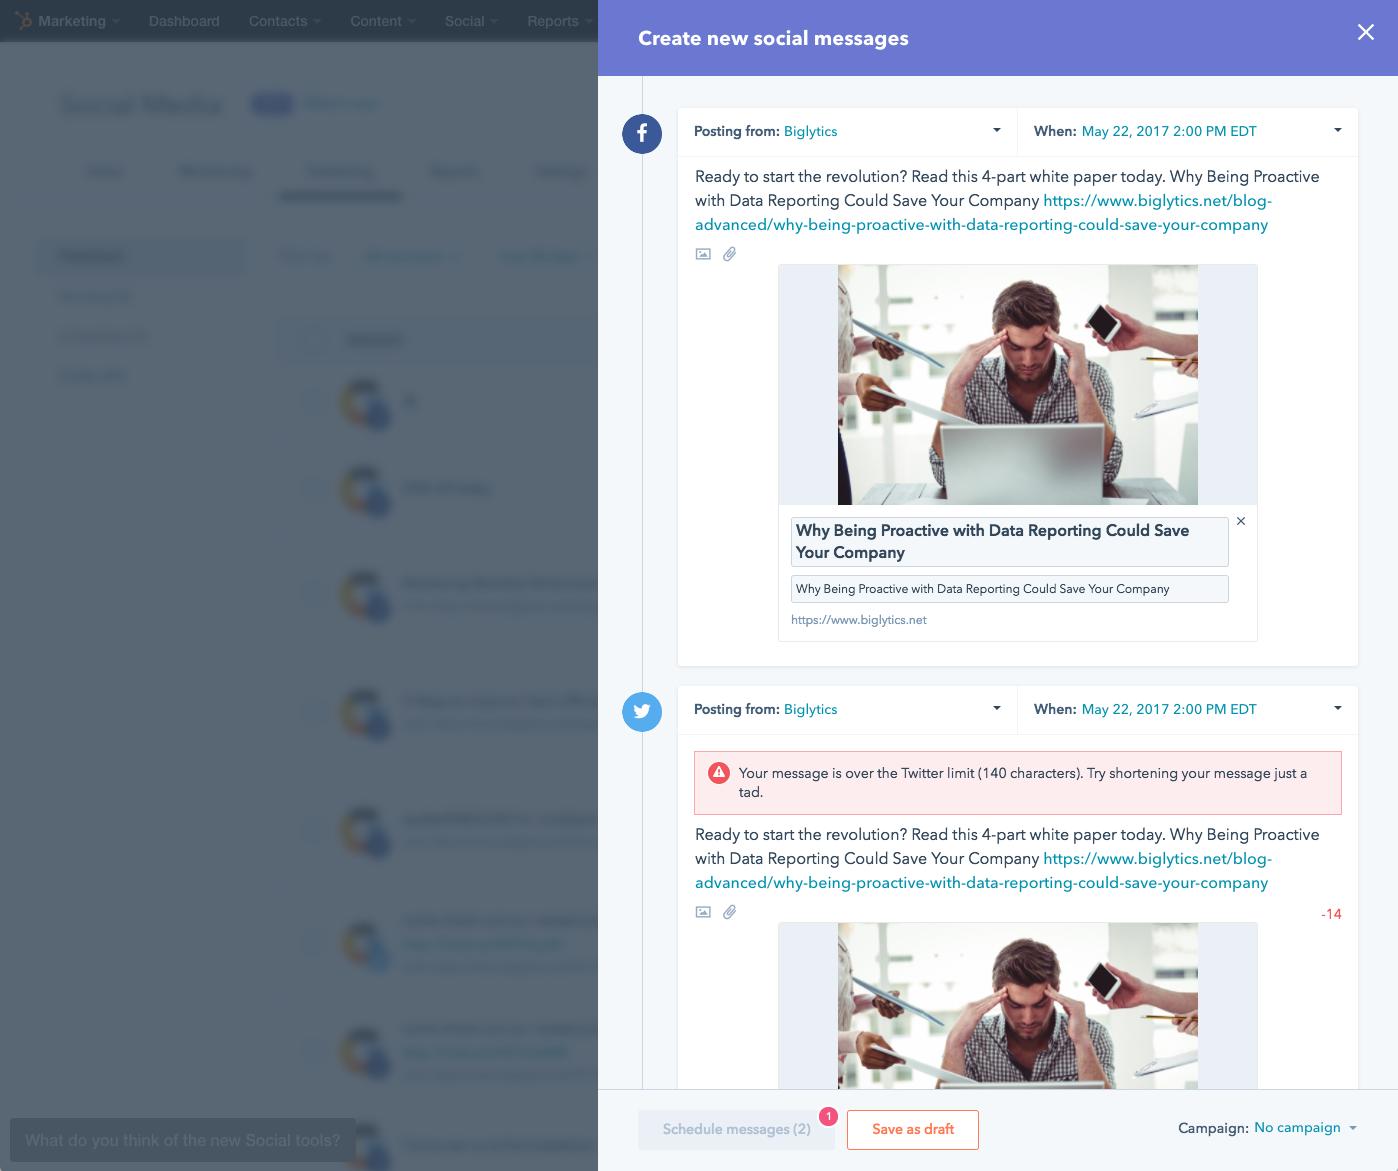 Introducing The All New HubSpot Social Tools